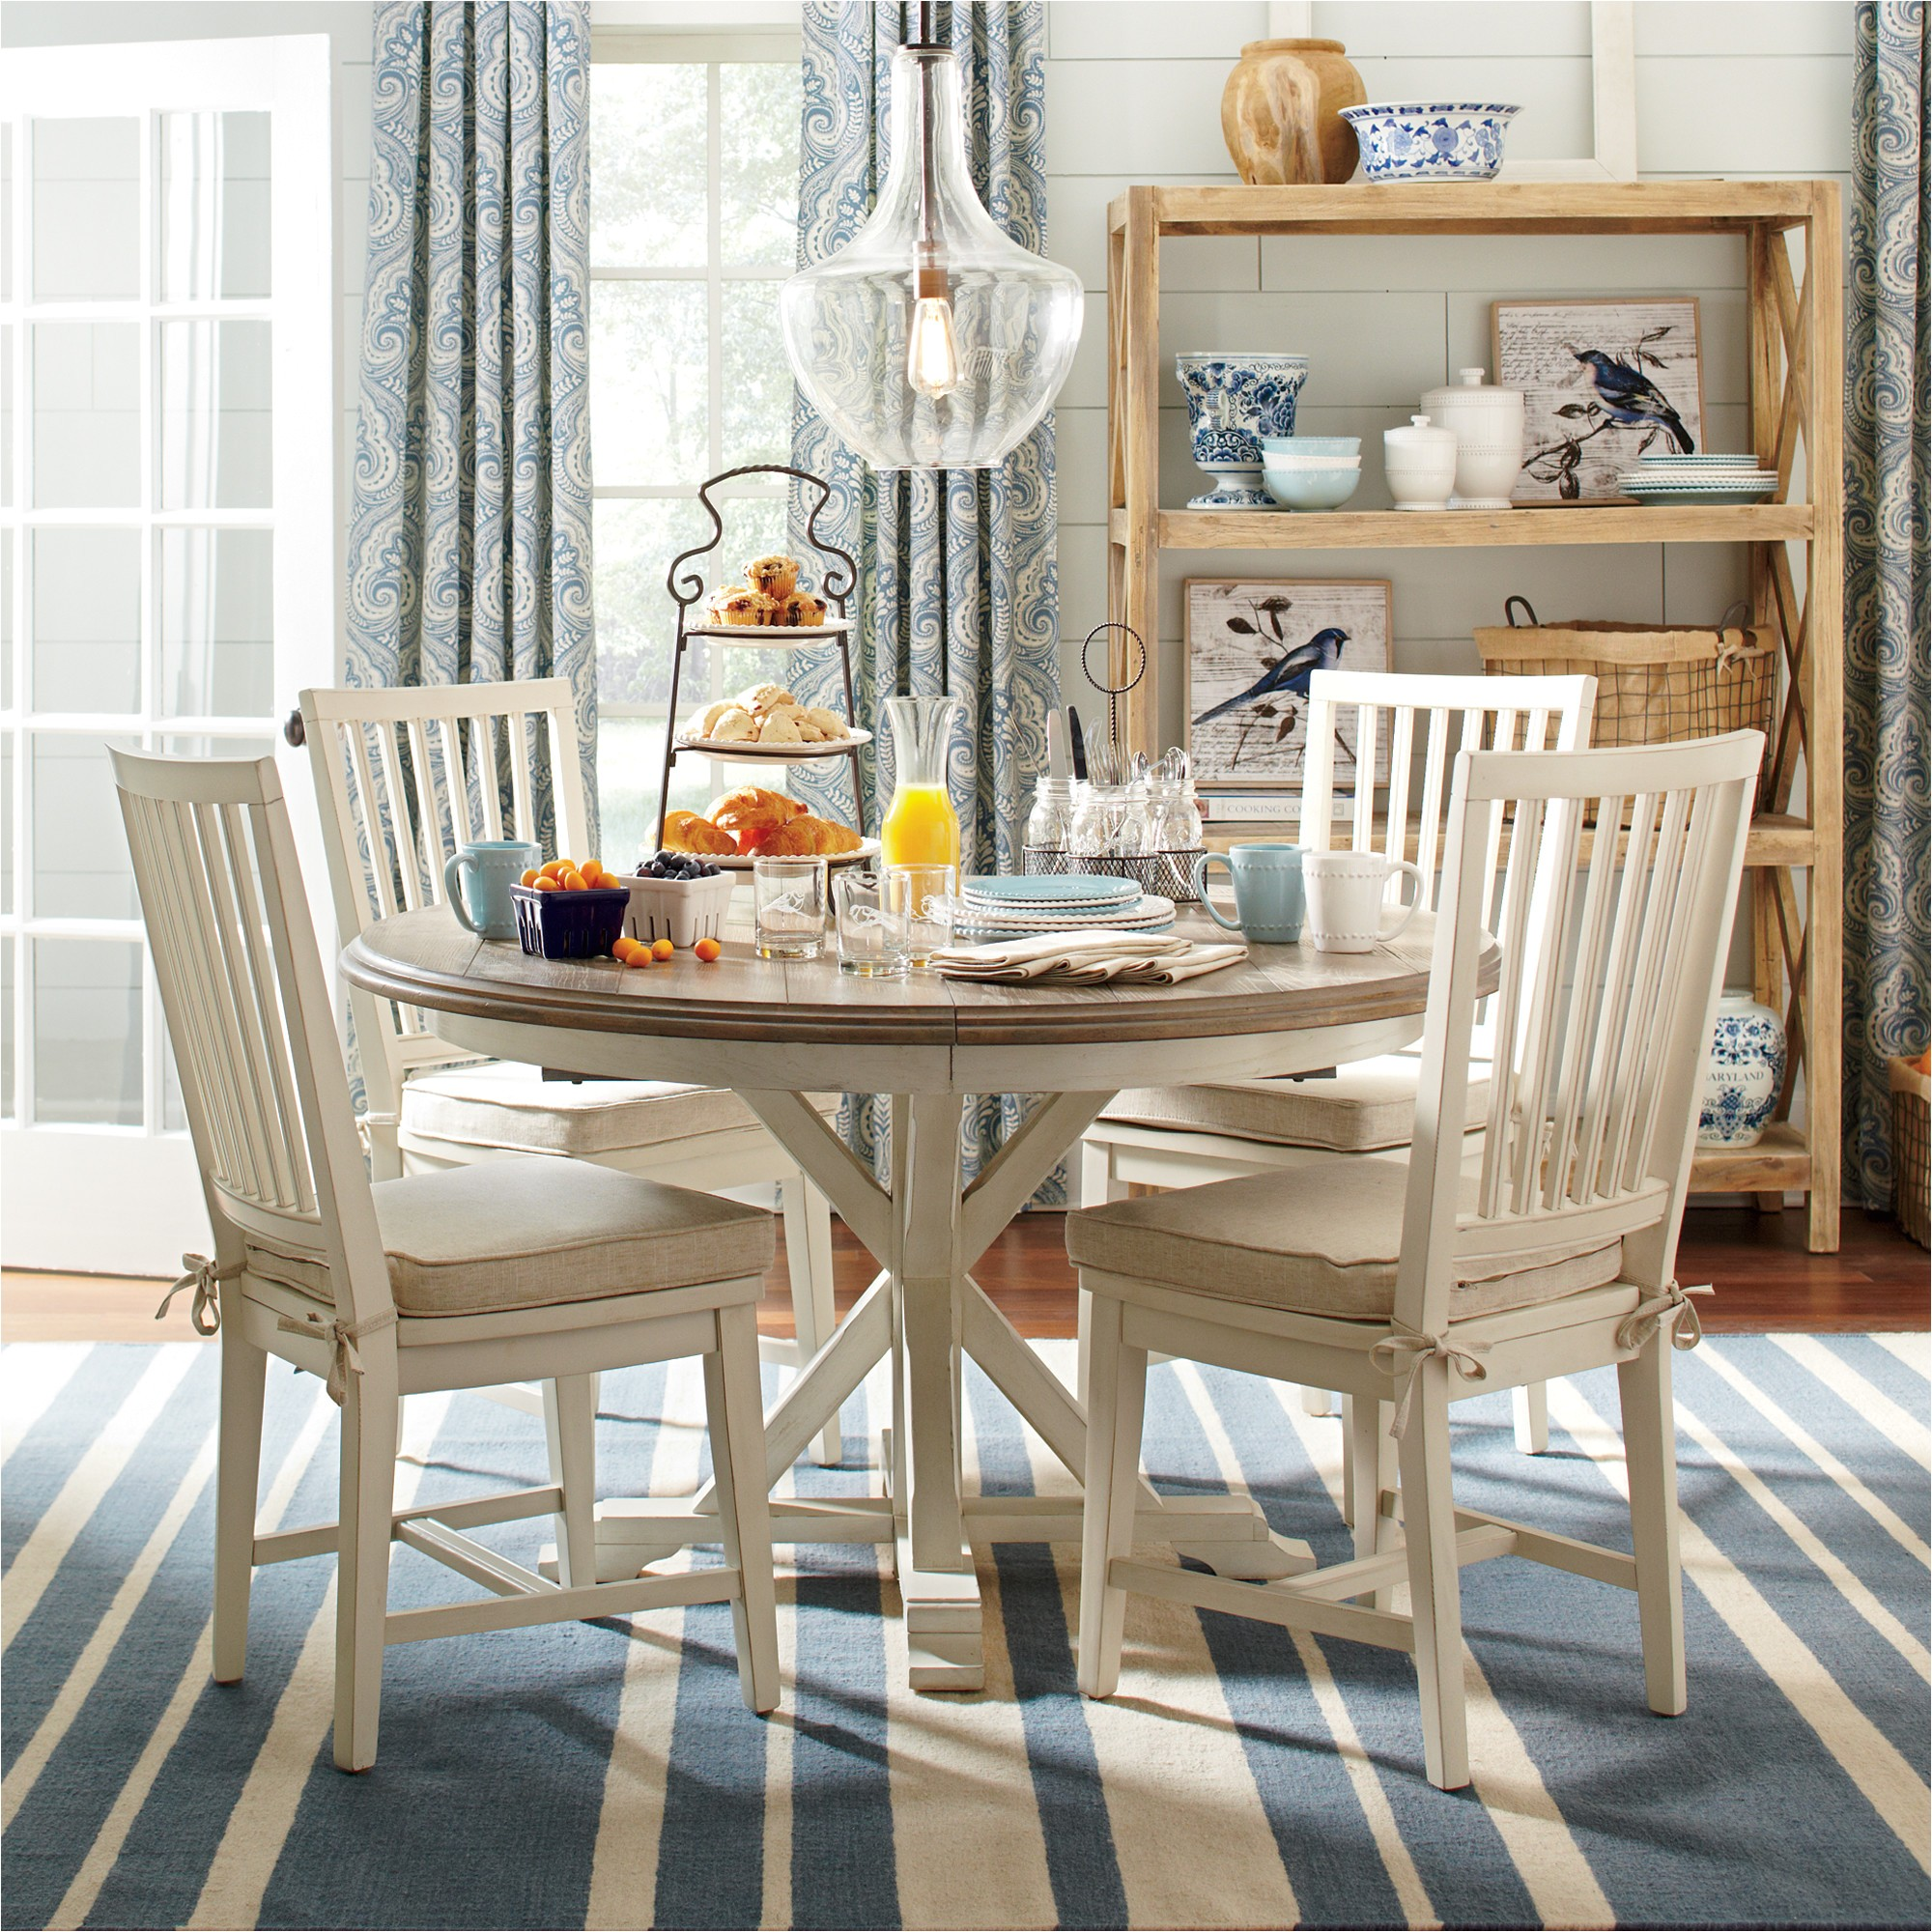 birch lane grafton extending round dining table bl3656 bl3656